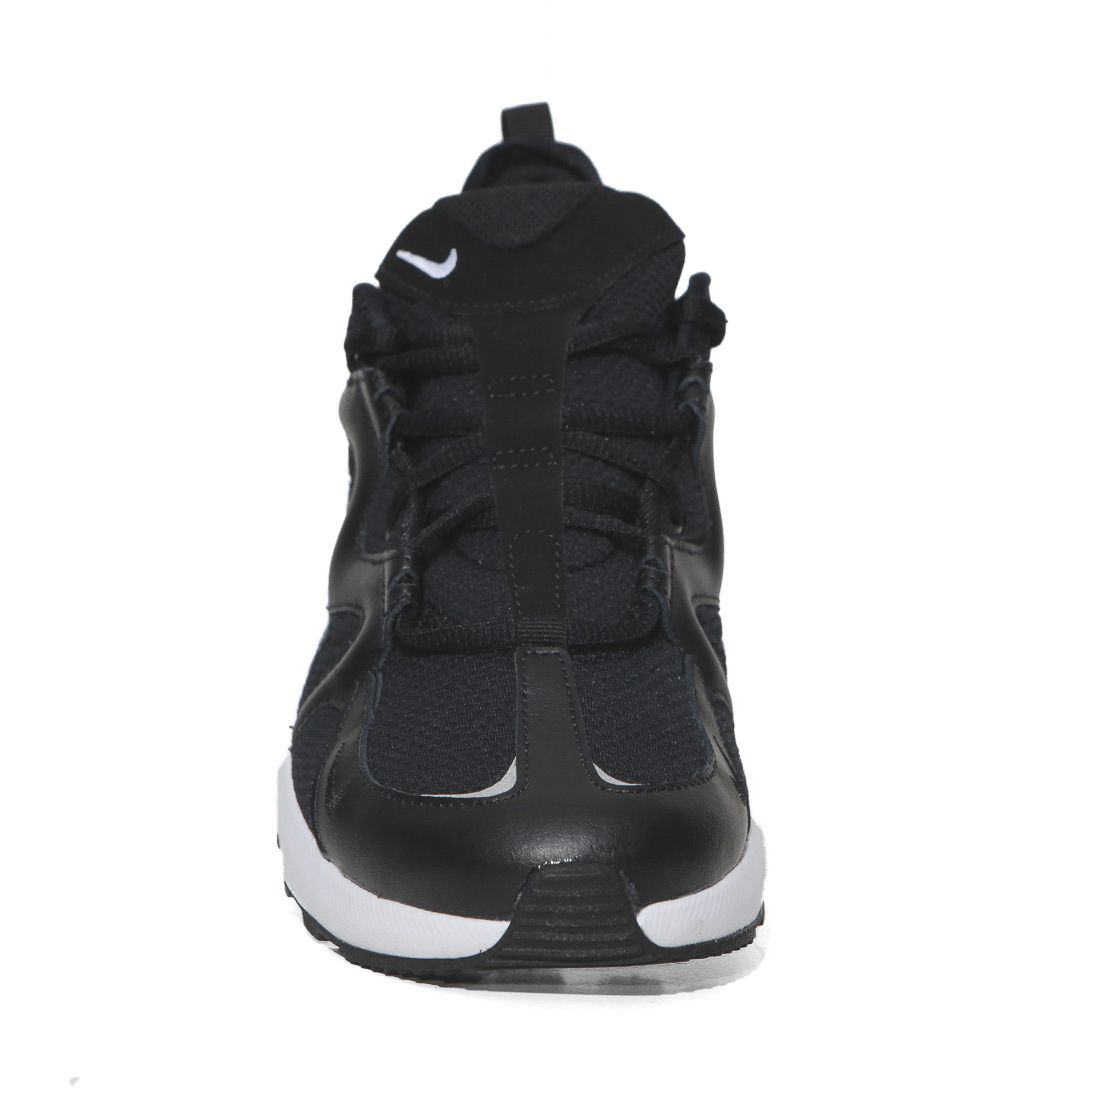 Tênis Nike Air Max Graviton AT4525